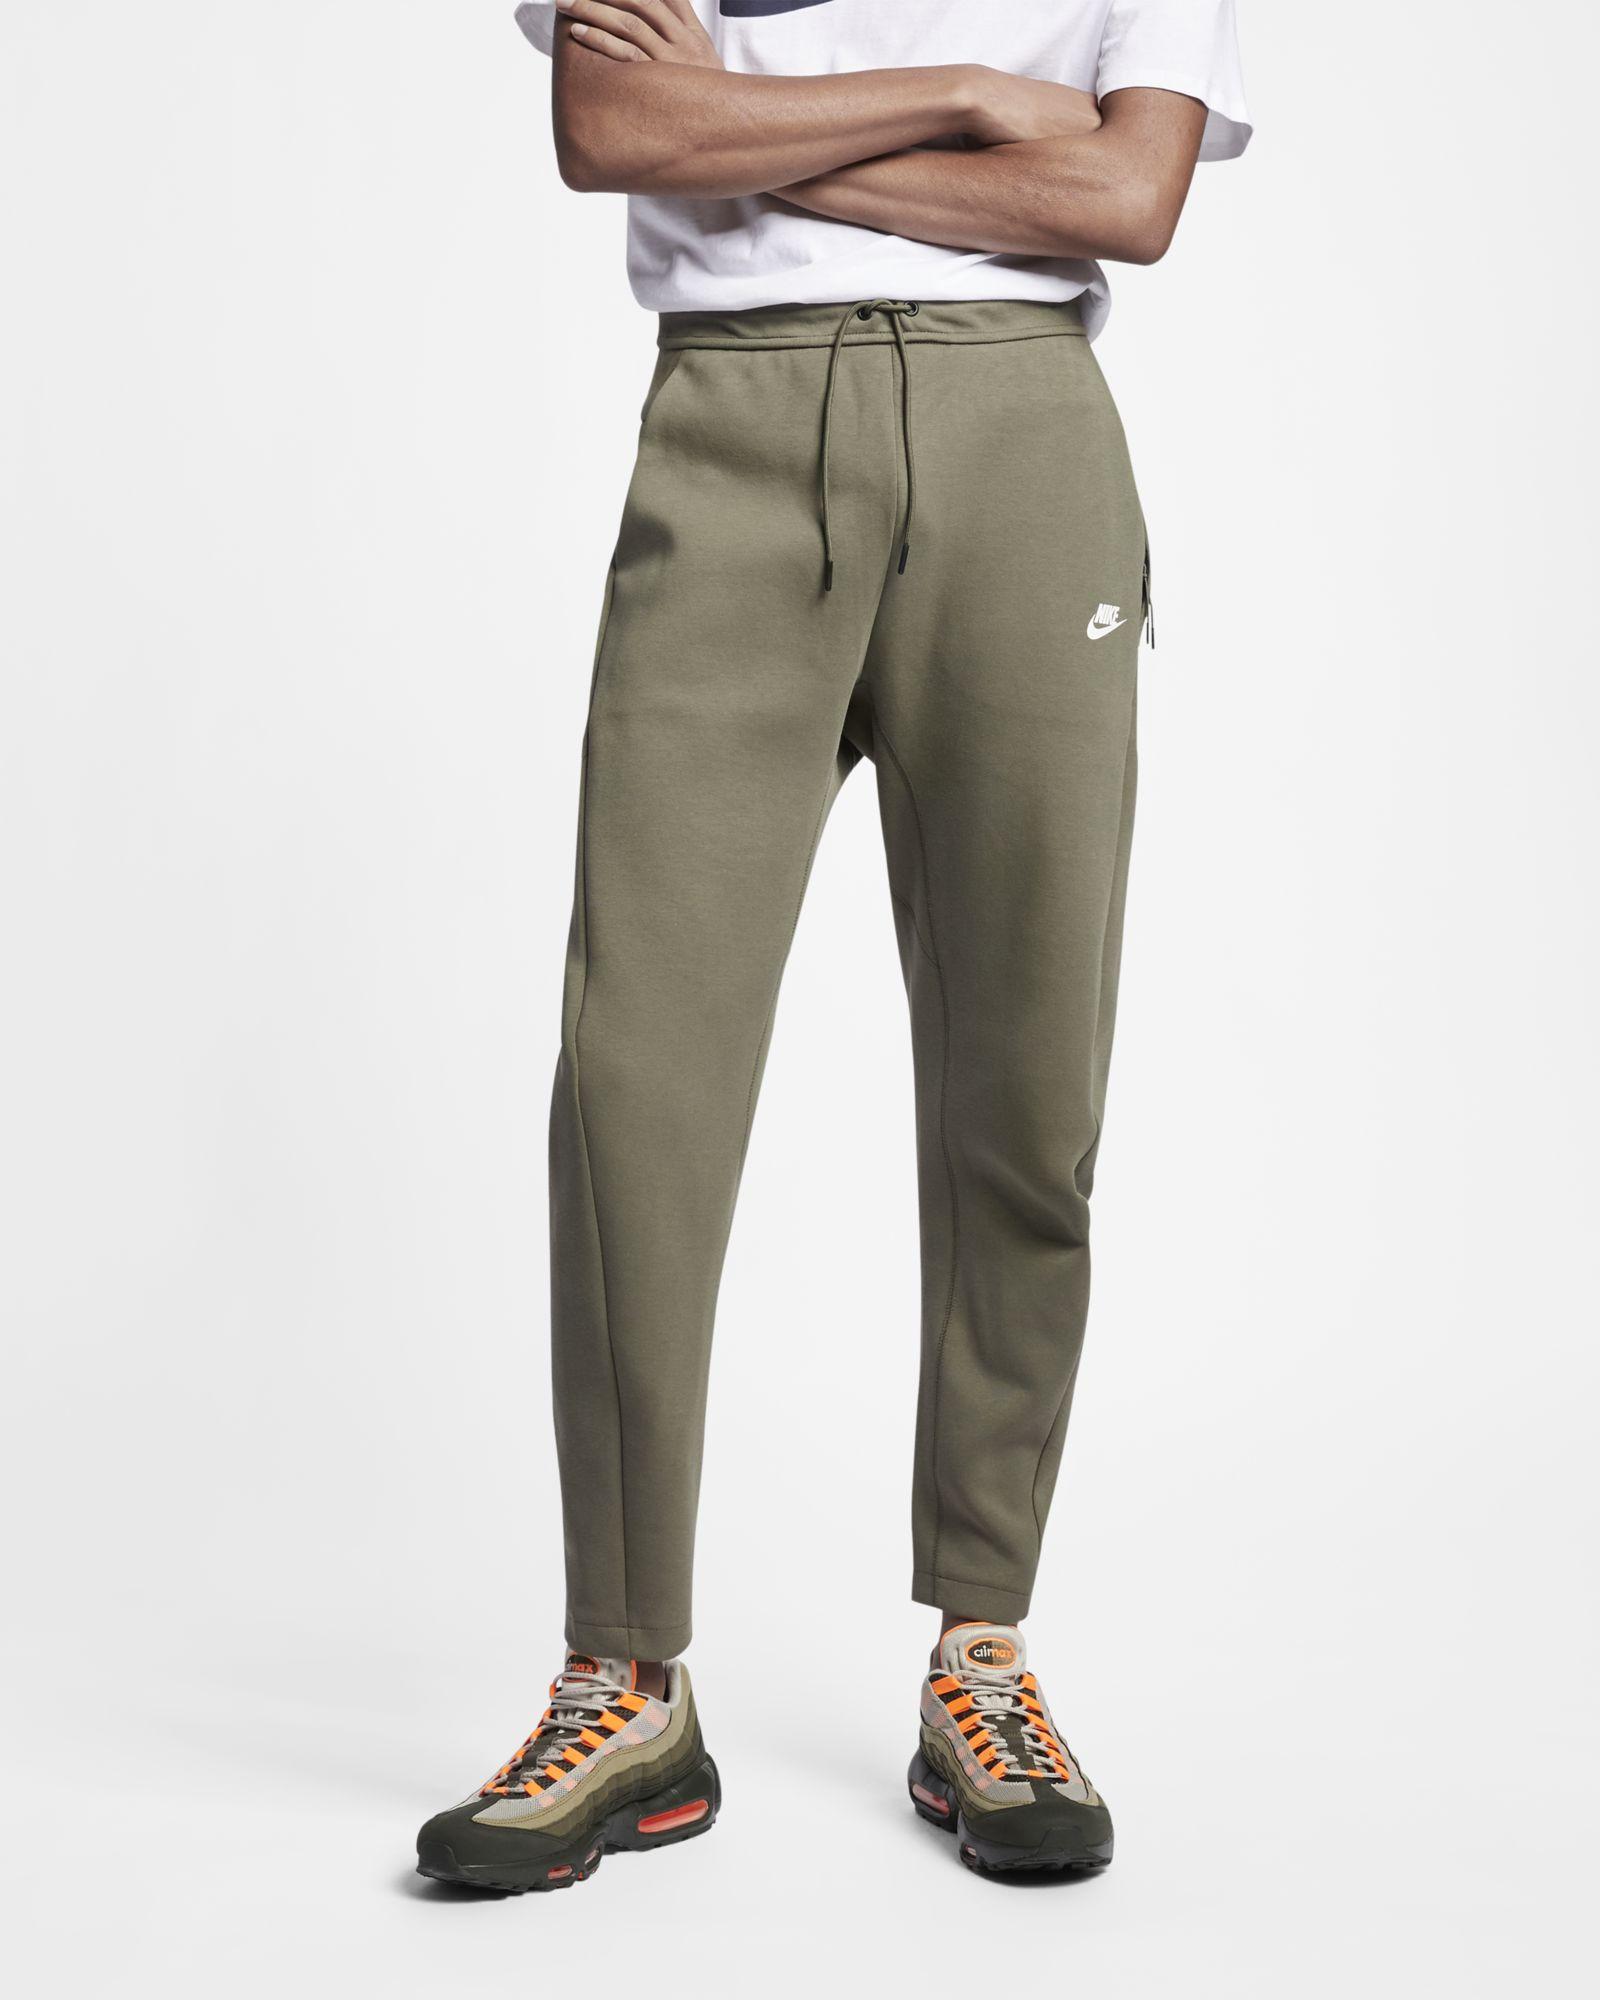 a2005b1215f8 Nike Tech Fleece Jogging Pants - SPORTING GOODS Sports Pants - Superfanas.lt